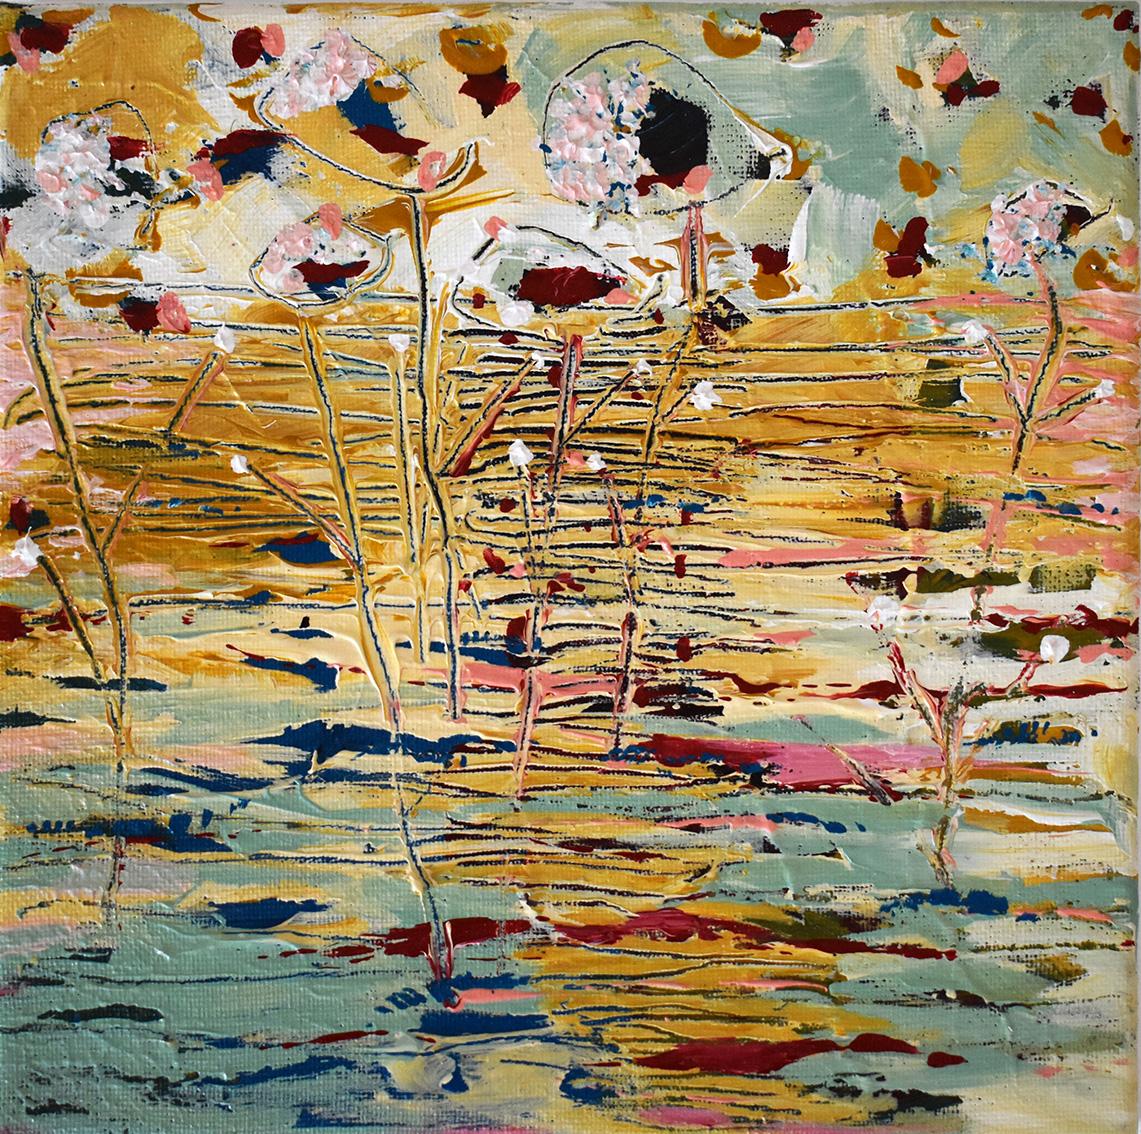 Silvia Golja, ''Wild flowers'', akril na platnu, 20x20 cm